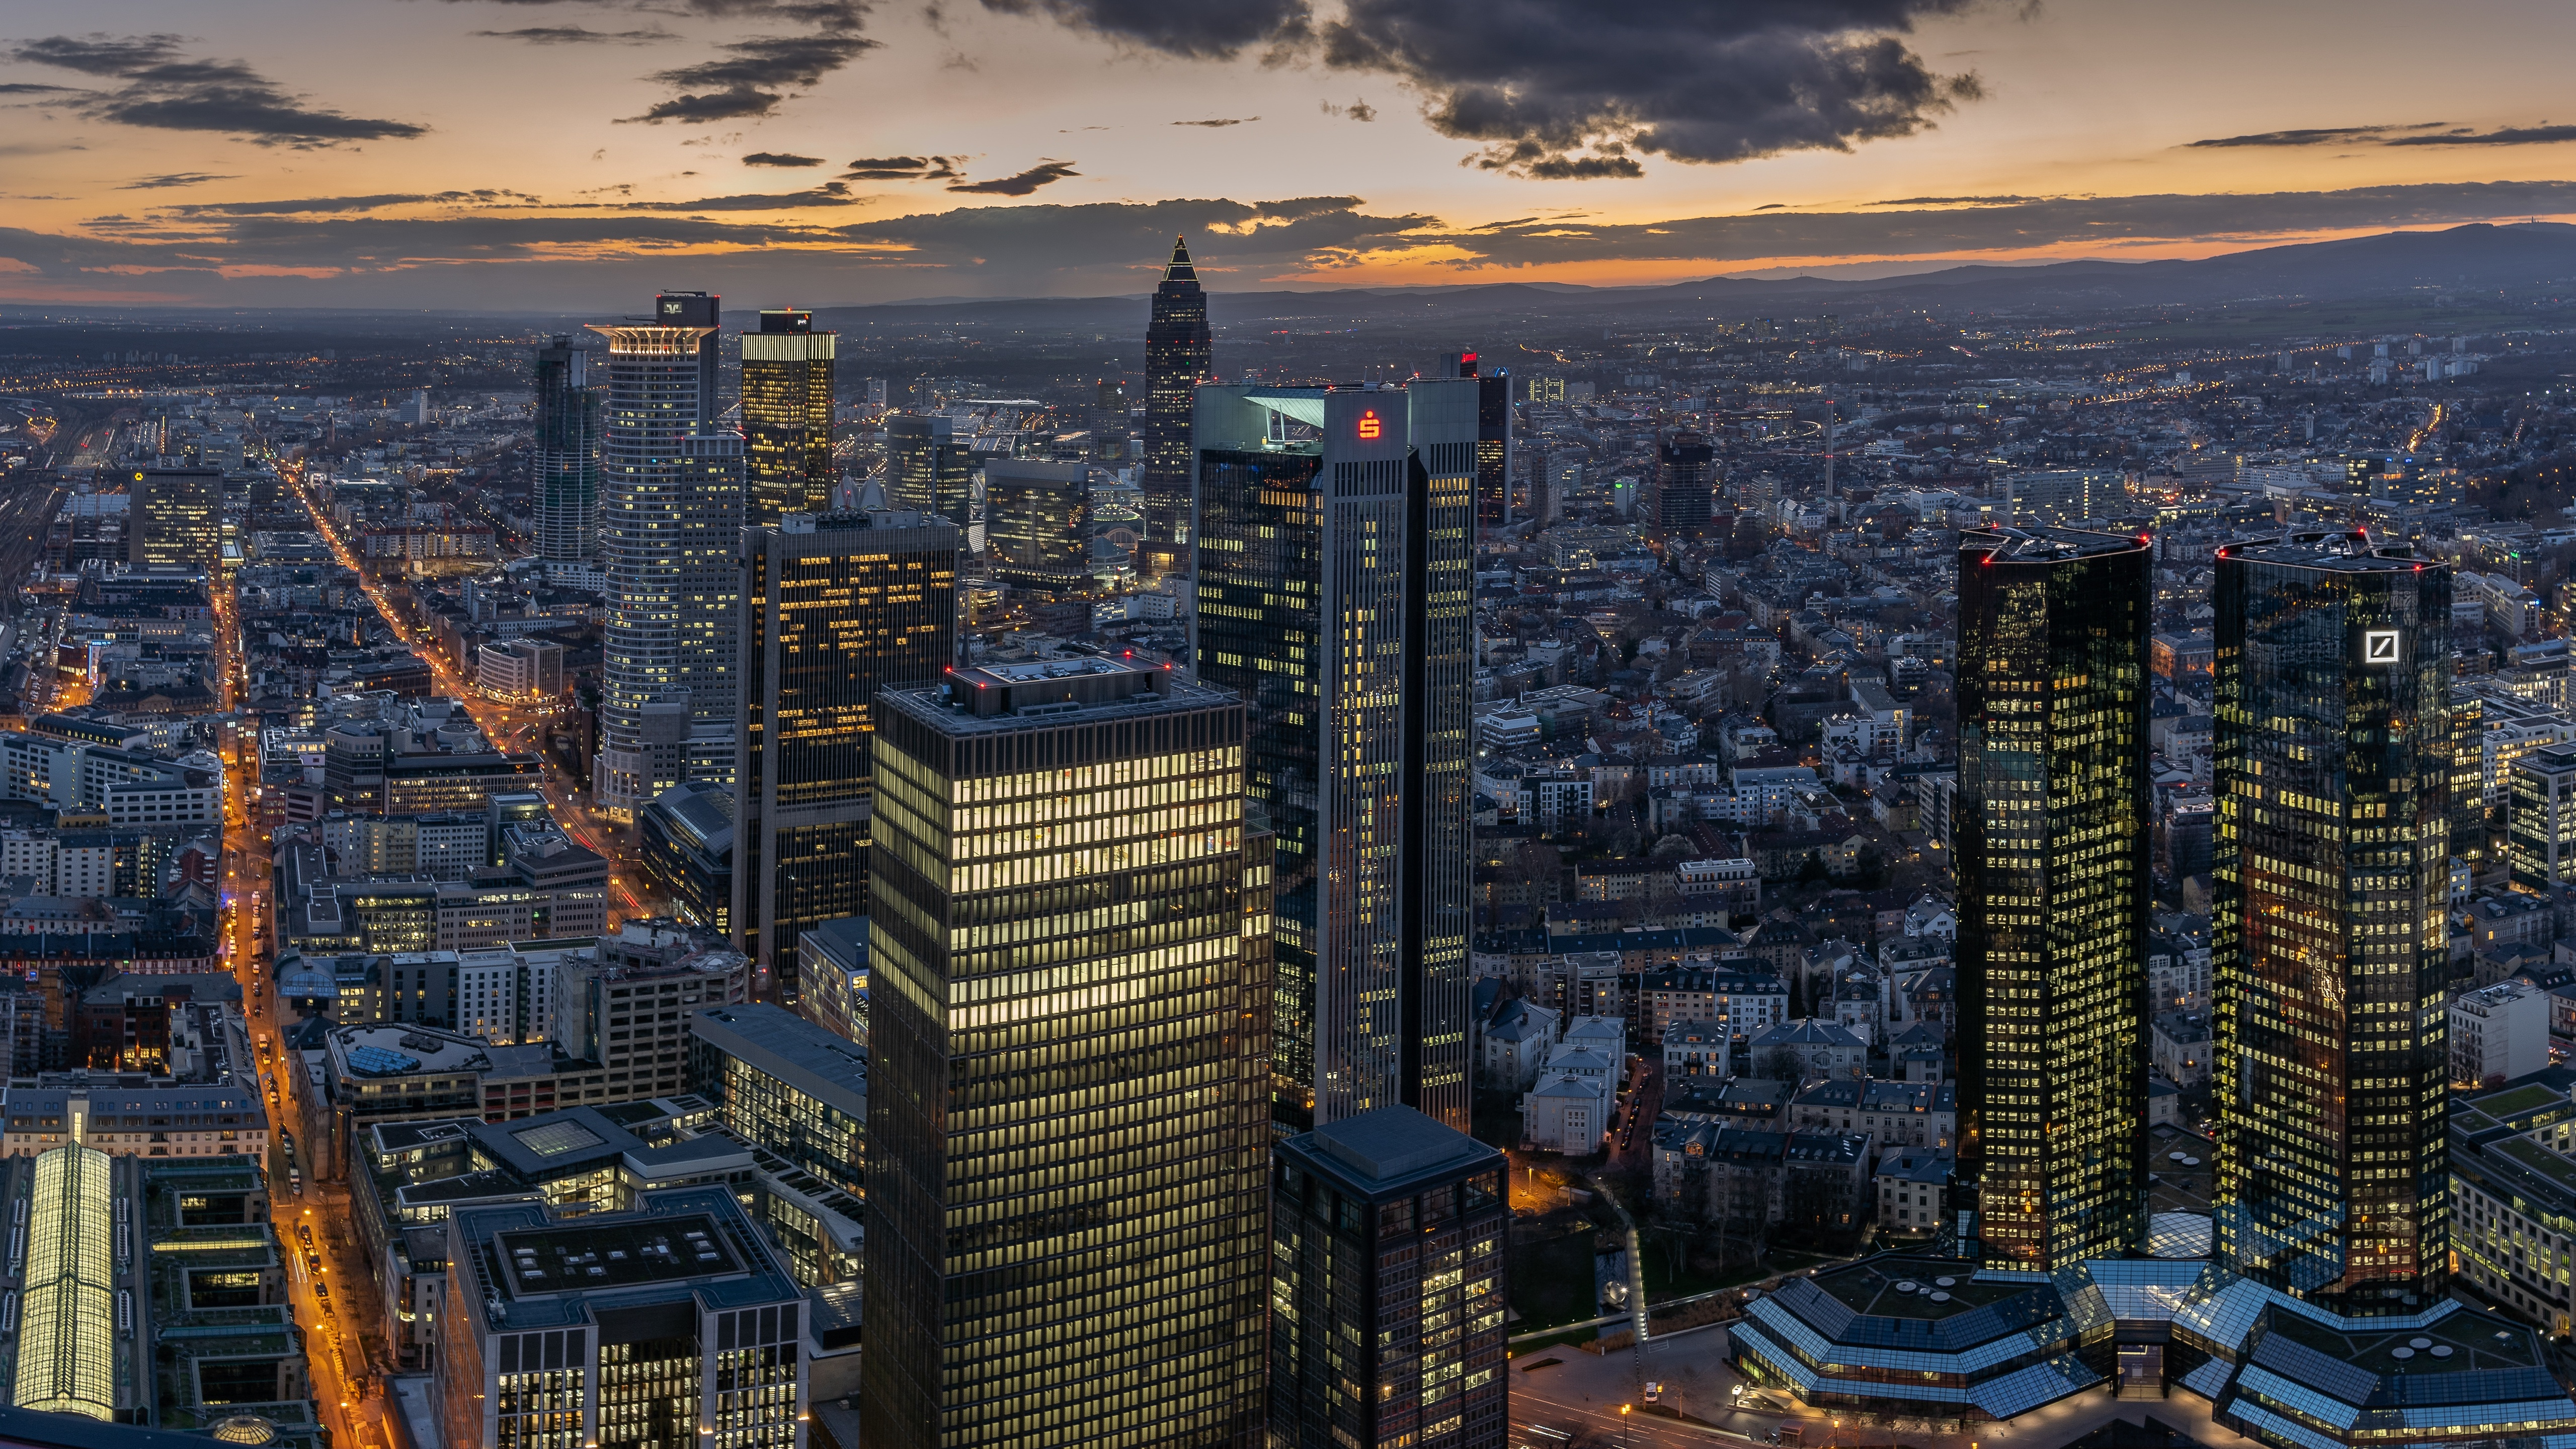 germany-frankfurt-skyscrapers-5k-jb.jpg